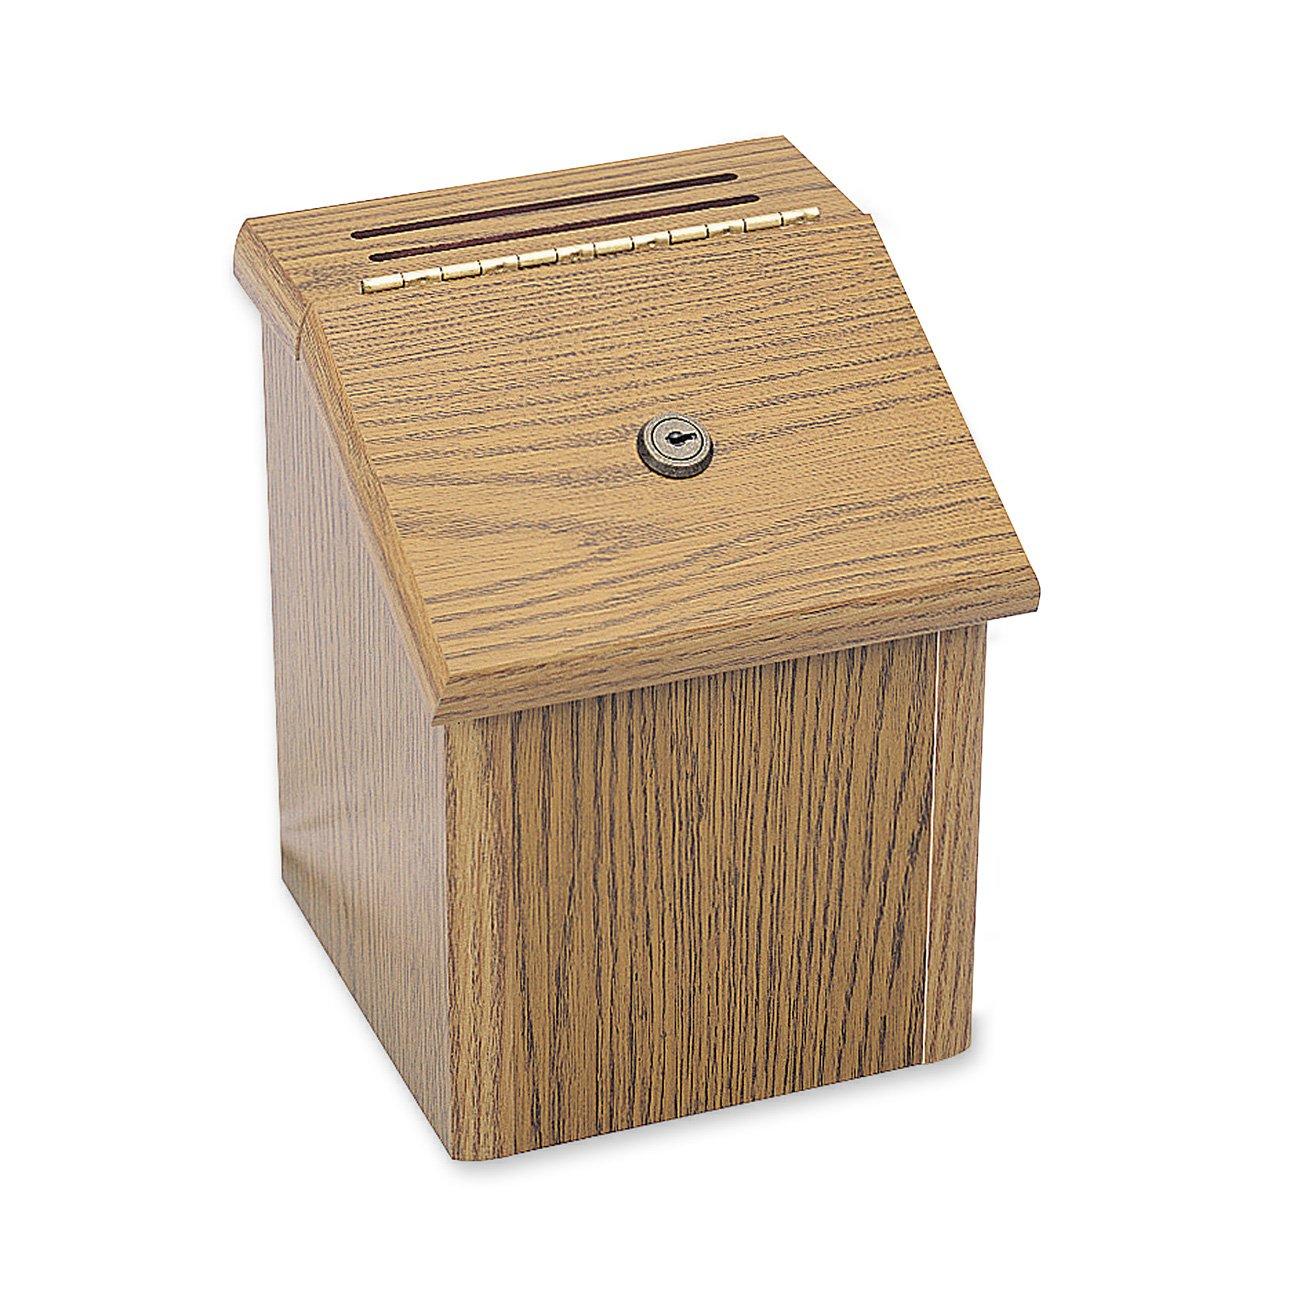 Safco - de Caja de sugerencias, de - madera 727bb4